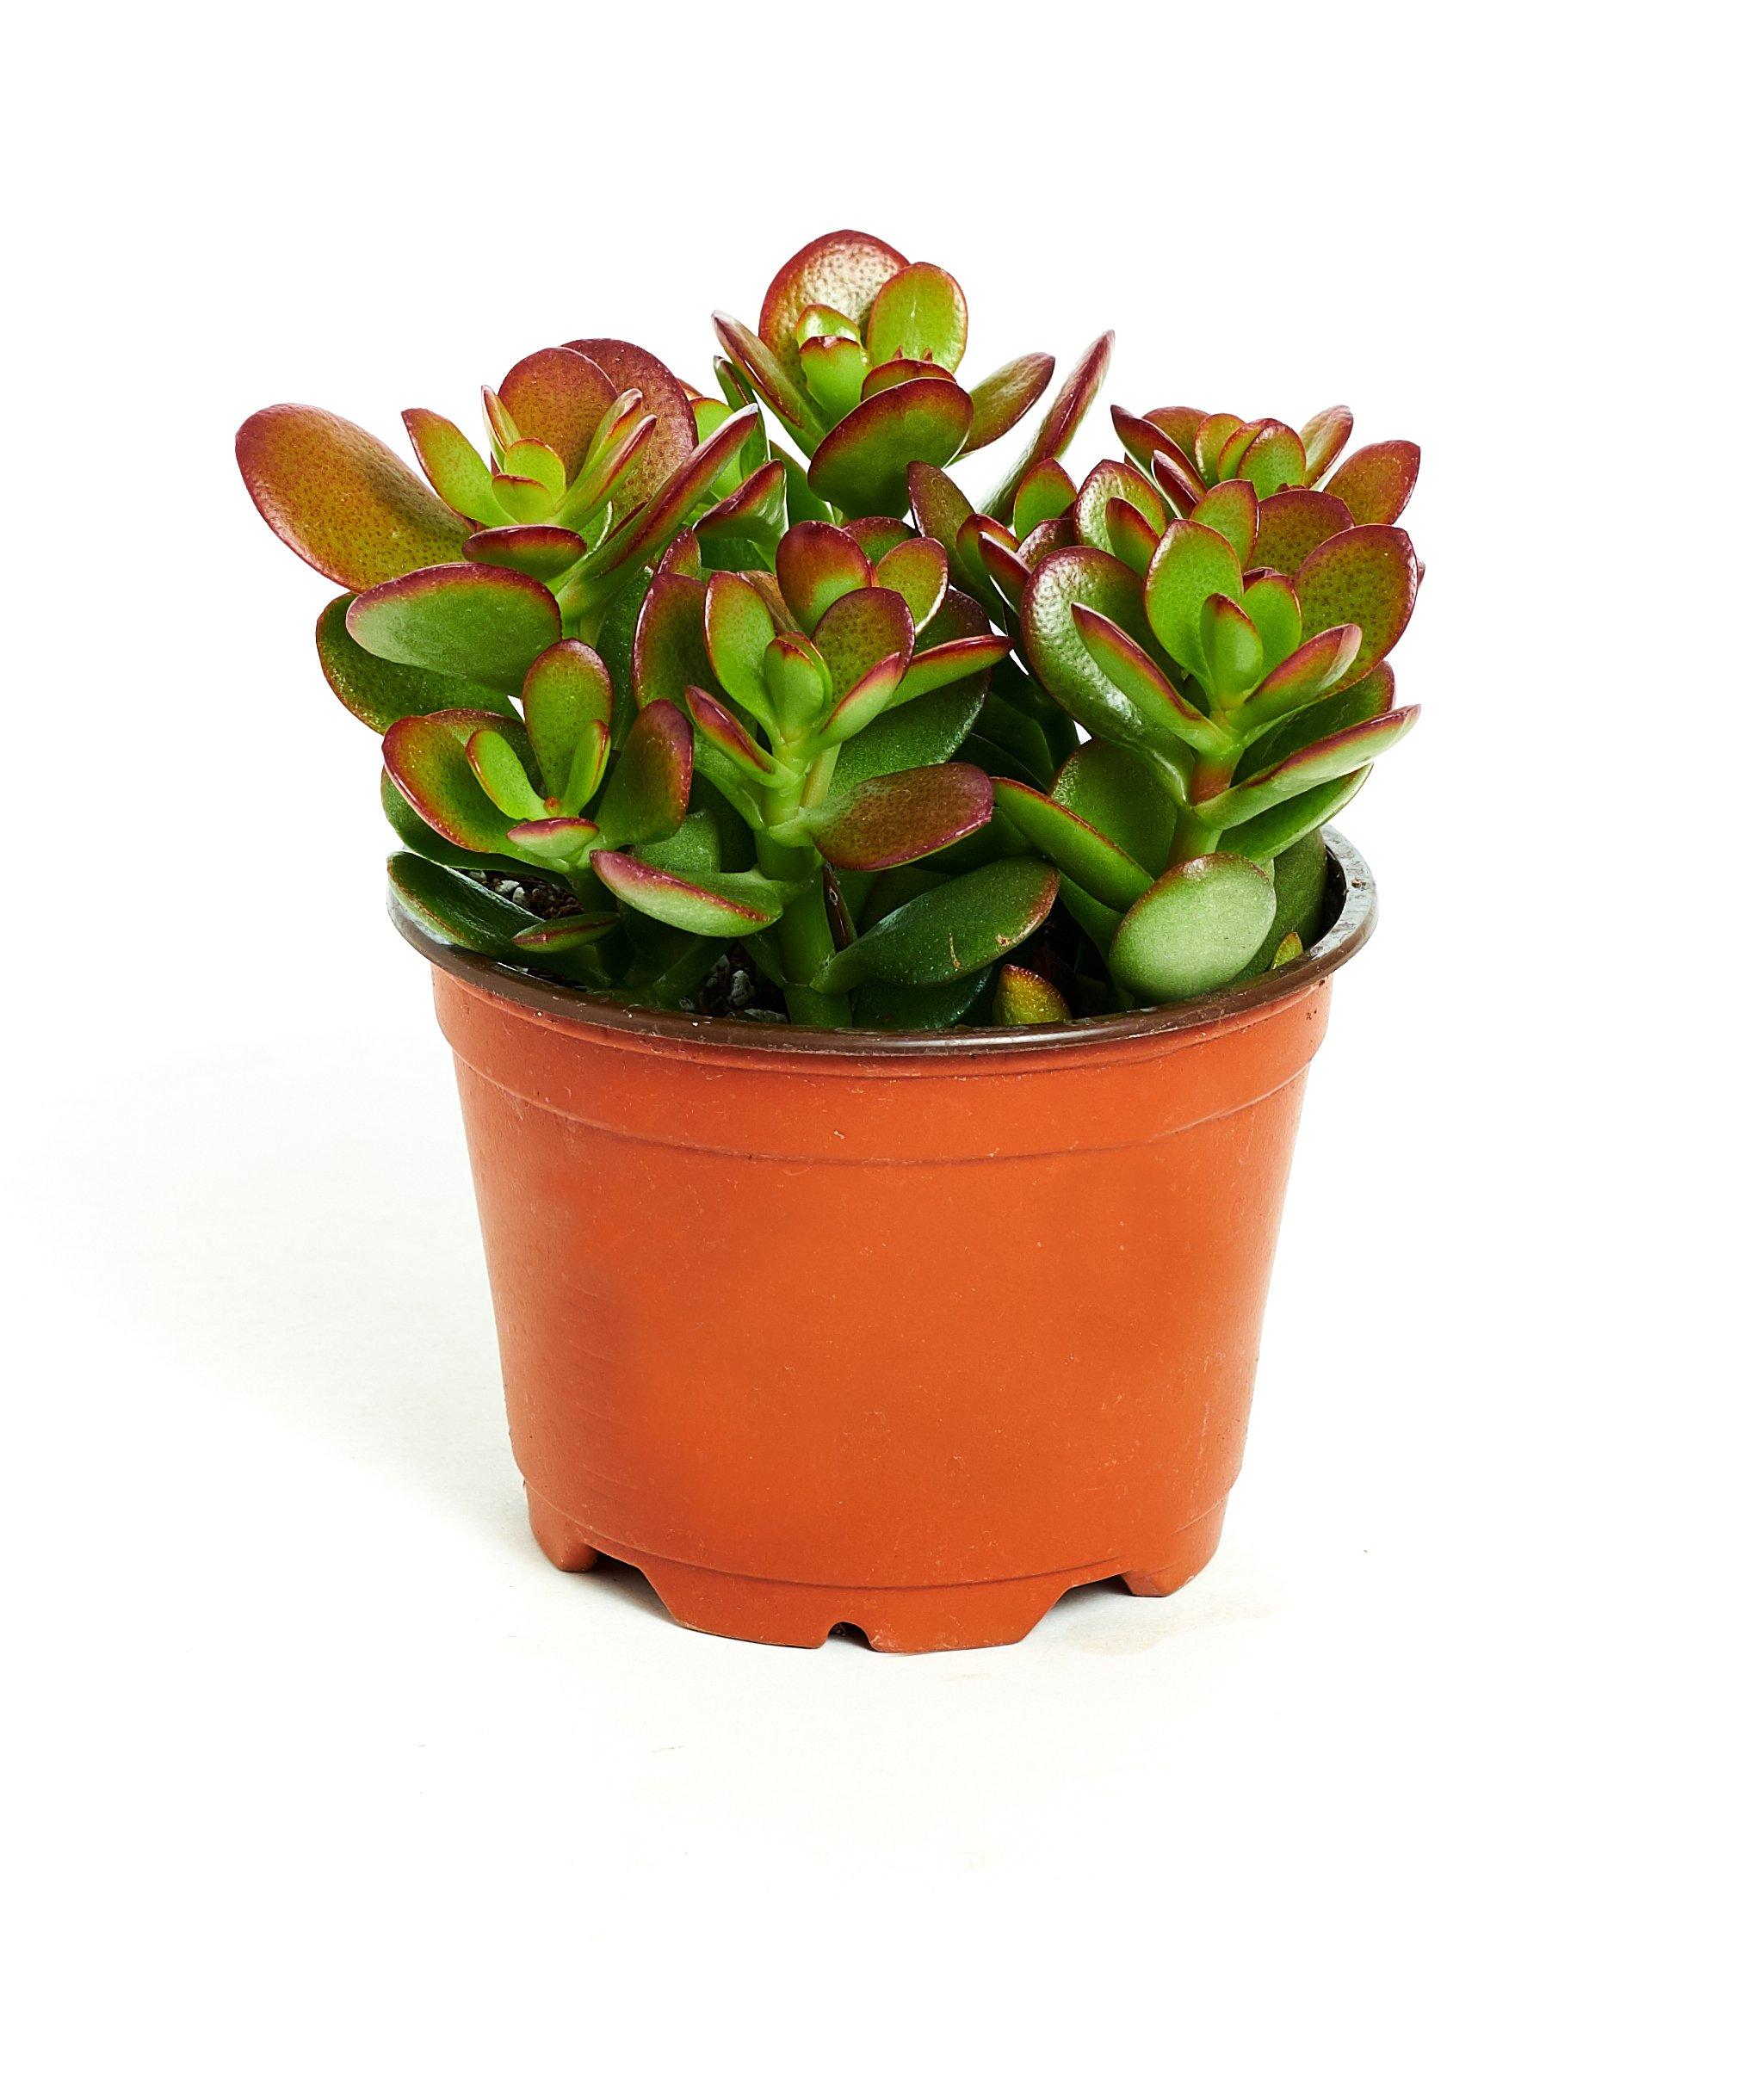 Jade Plant - Crassula ovuta - Easy to Grow - 4'' Pot